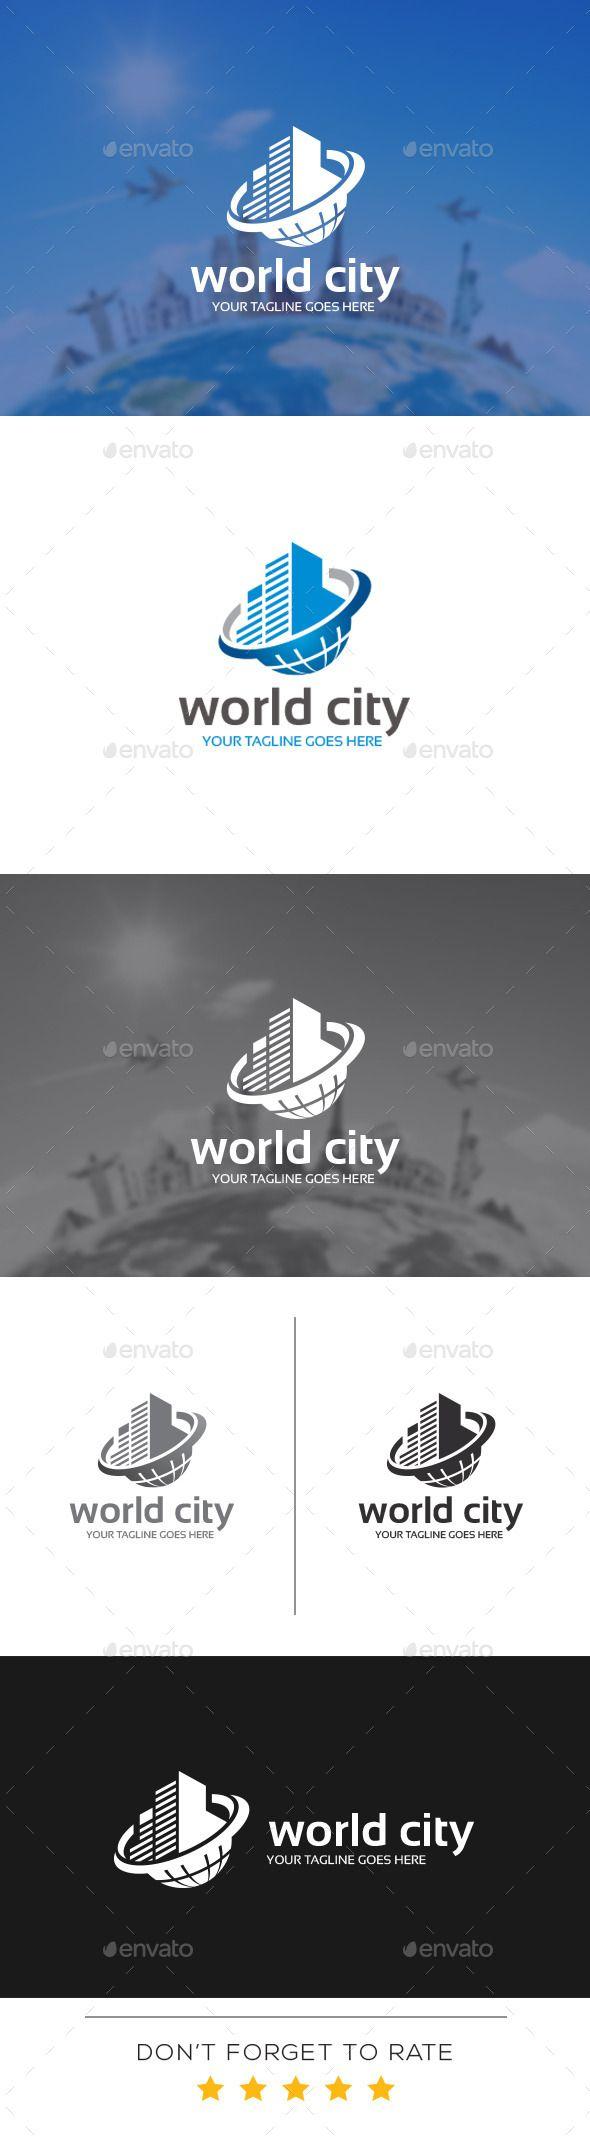 World City Logo Design Template Vector #logotype Download it here:  http://graphicriver.net/item/world-city-logo-template/10998276?s_rank=367?ref=nexion